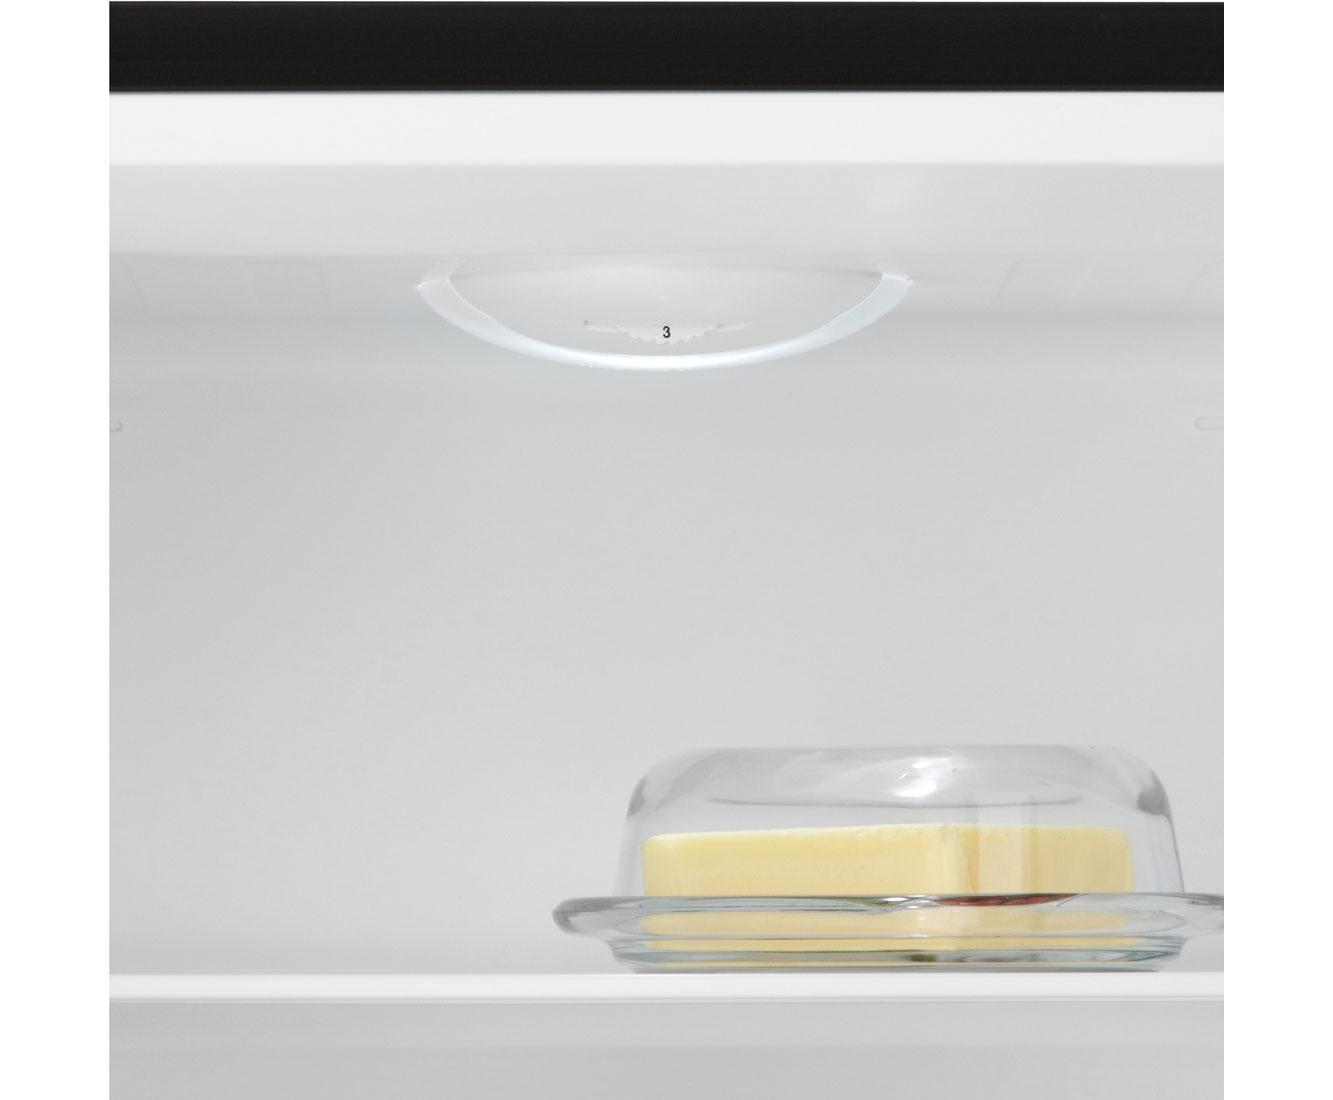 Bomann Kühlschrank Lampe : Bomann kg kühl gefrierkombination edelstahl optik a